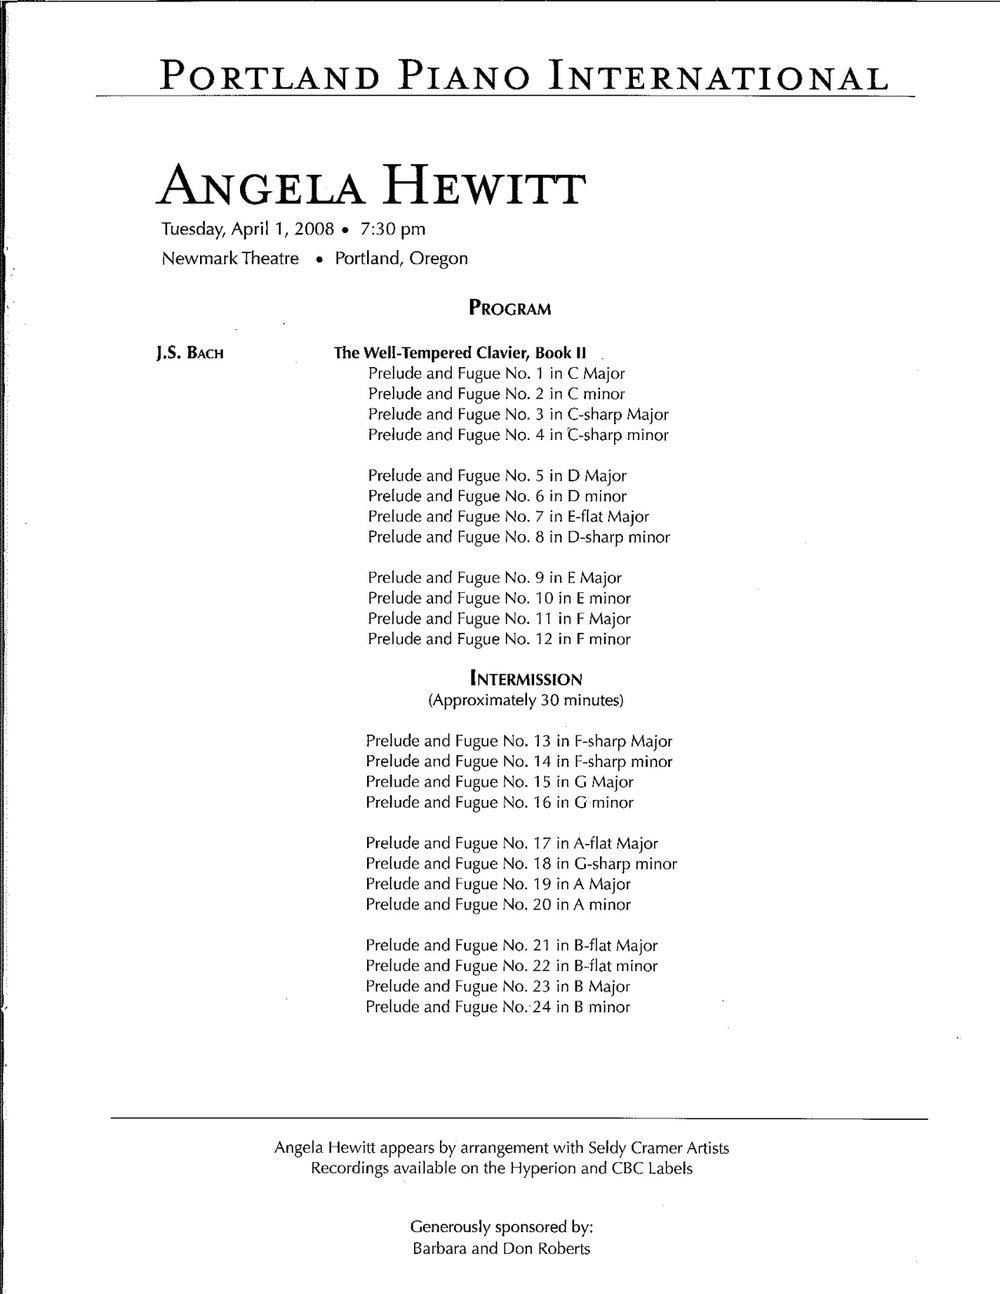 Hewitt_Program3.jpg